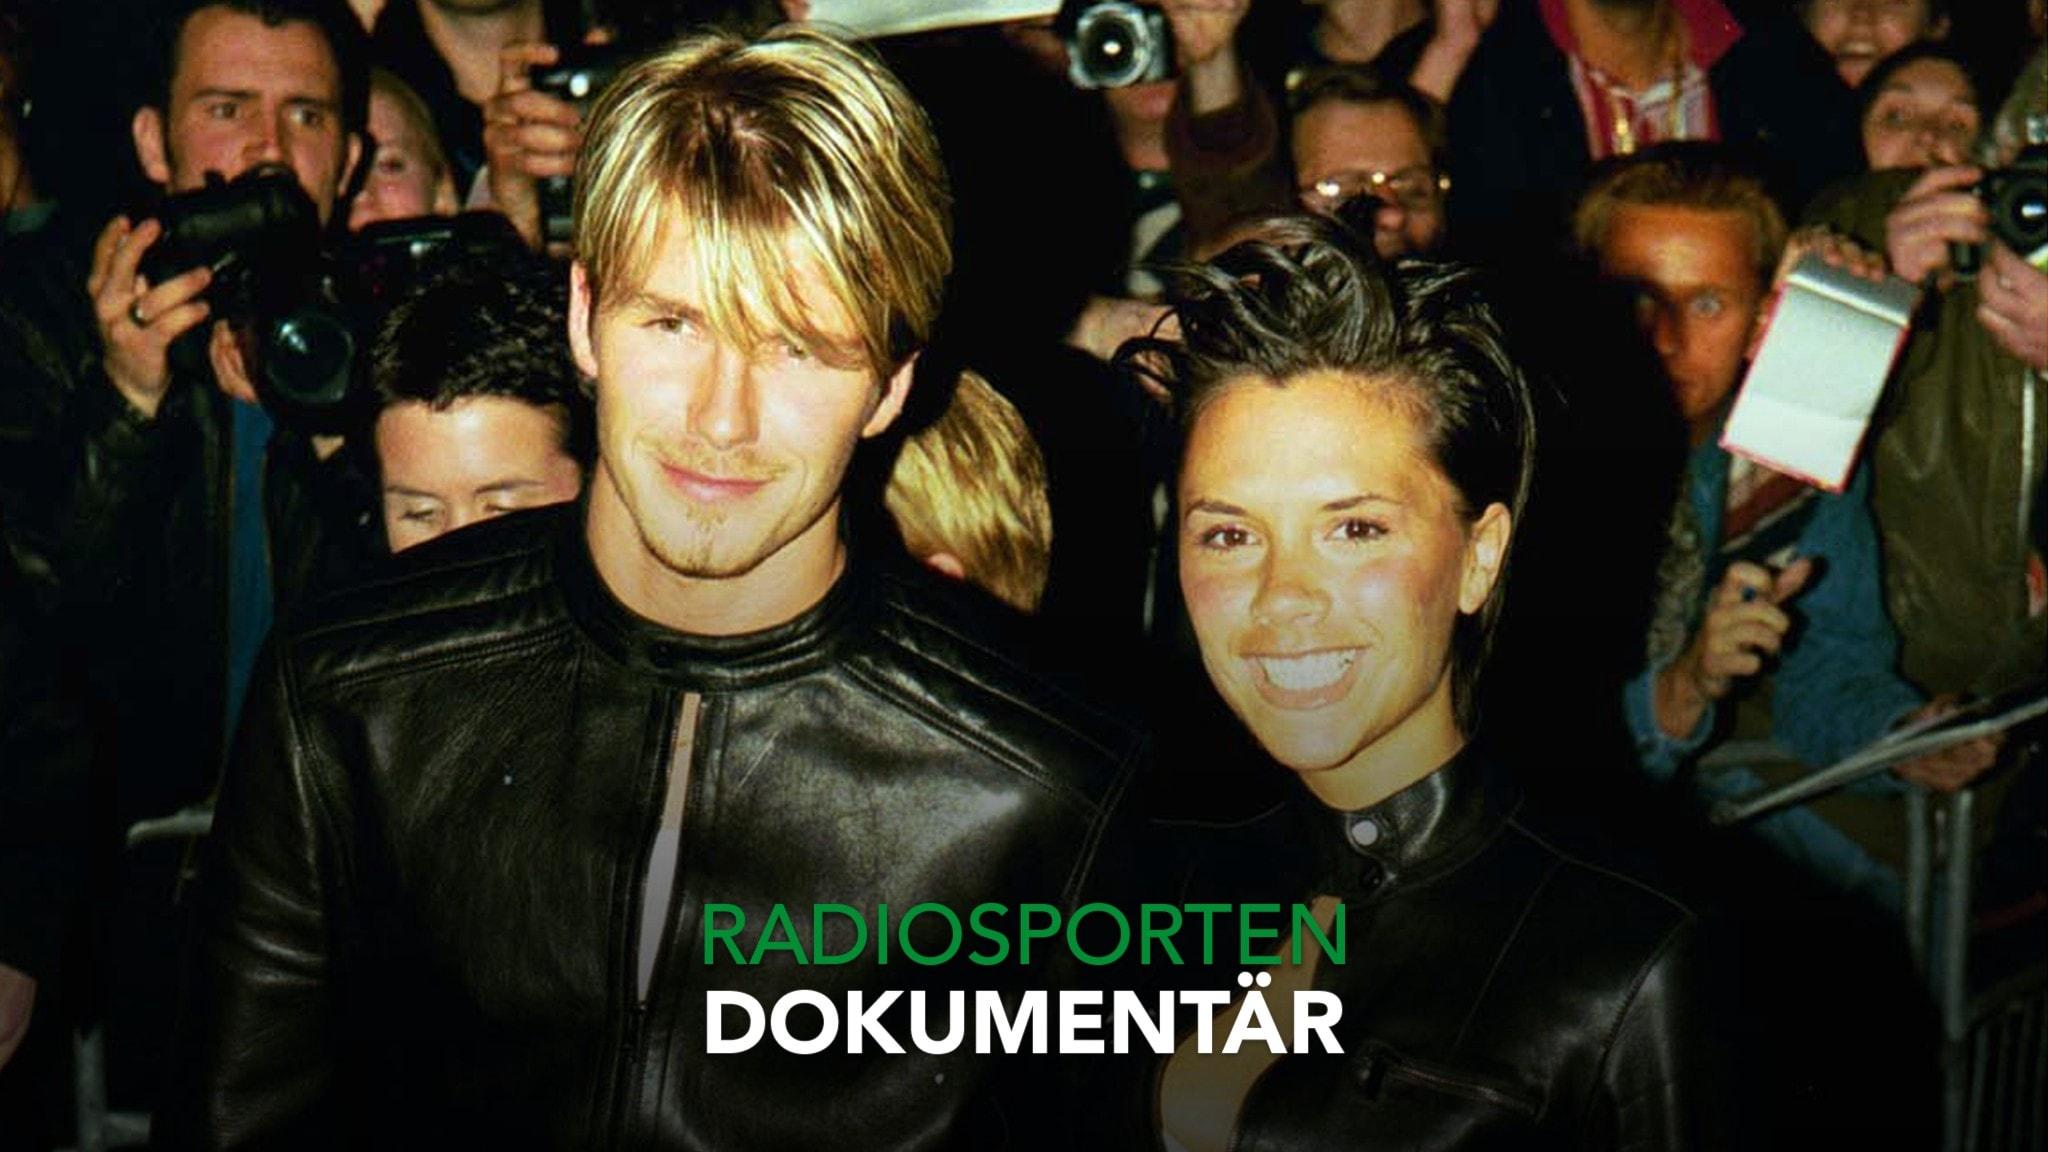 Paret David och Victoria Beckham